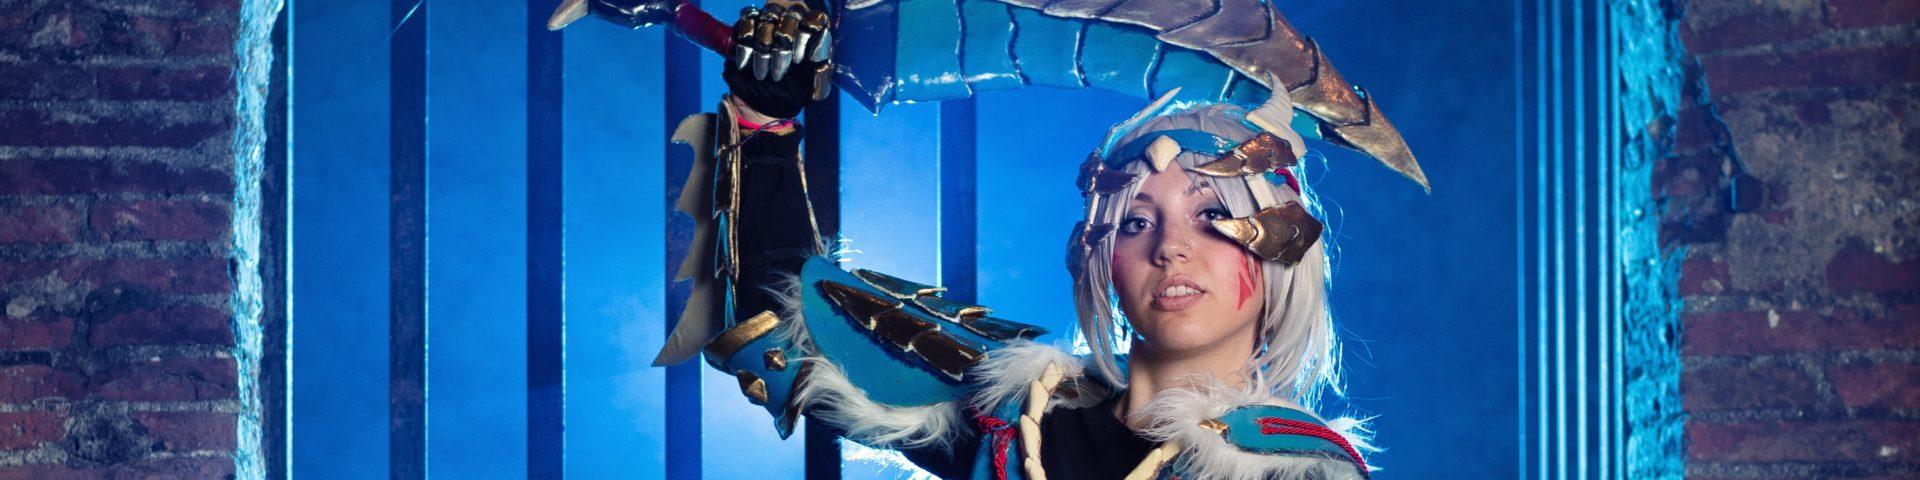 Lelly Cosplay zinogre armor set da monster hunter 3